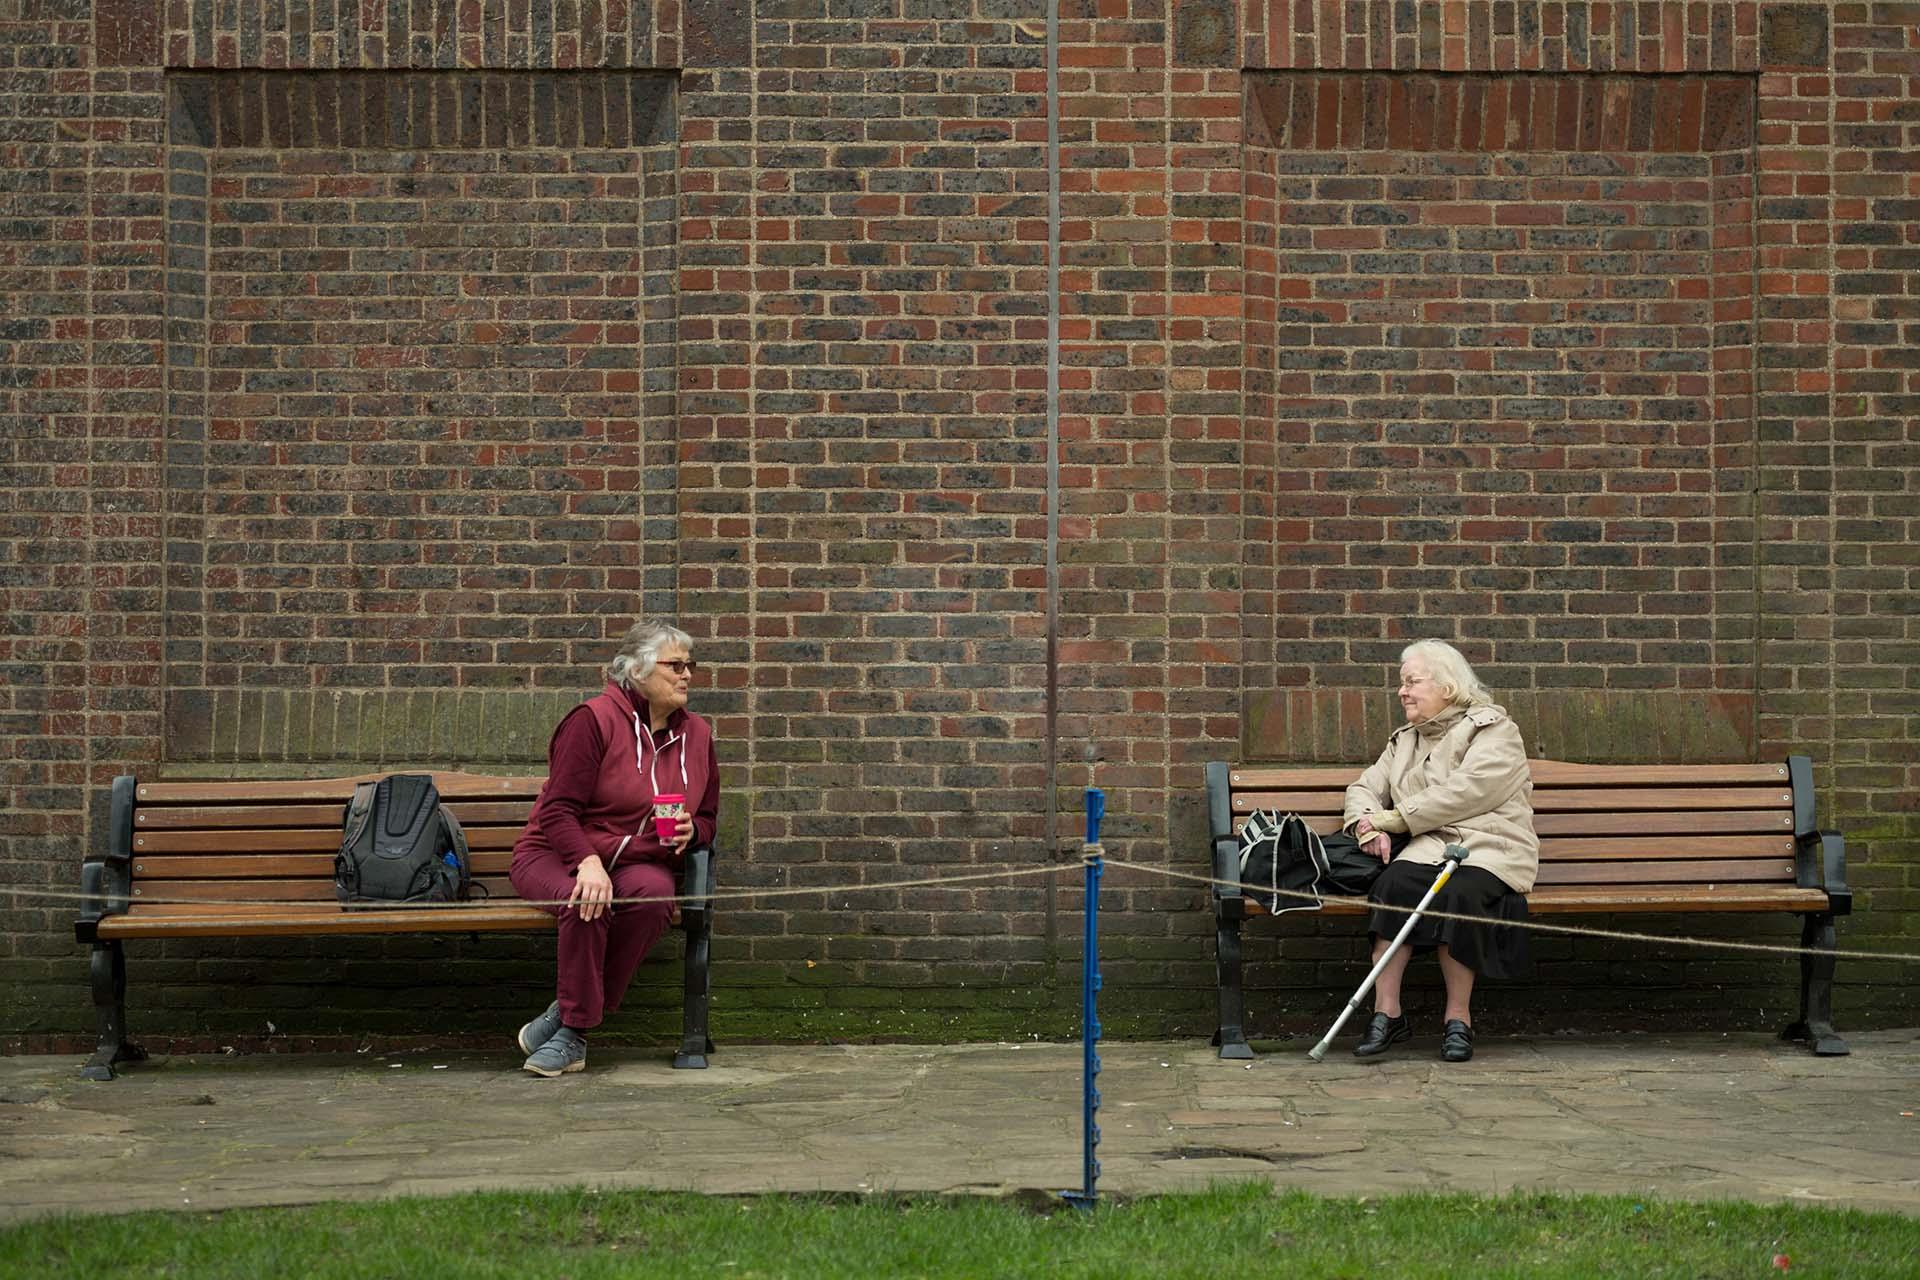 Dos mujeres conversan en un parque de York, Reino Unido.